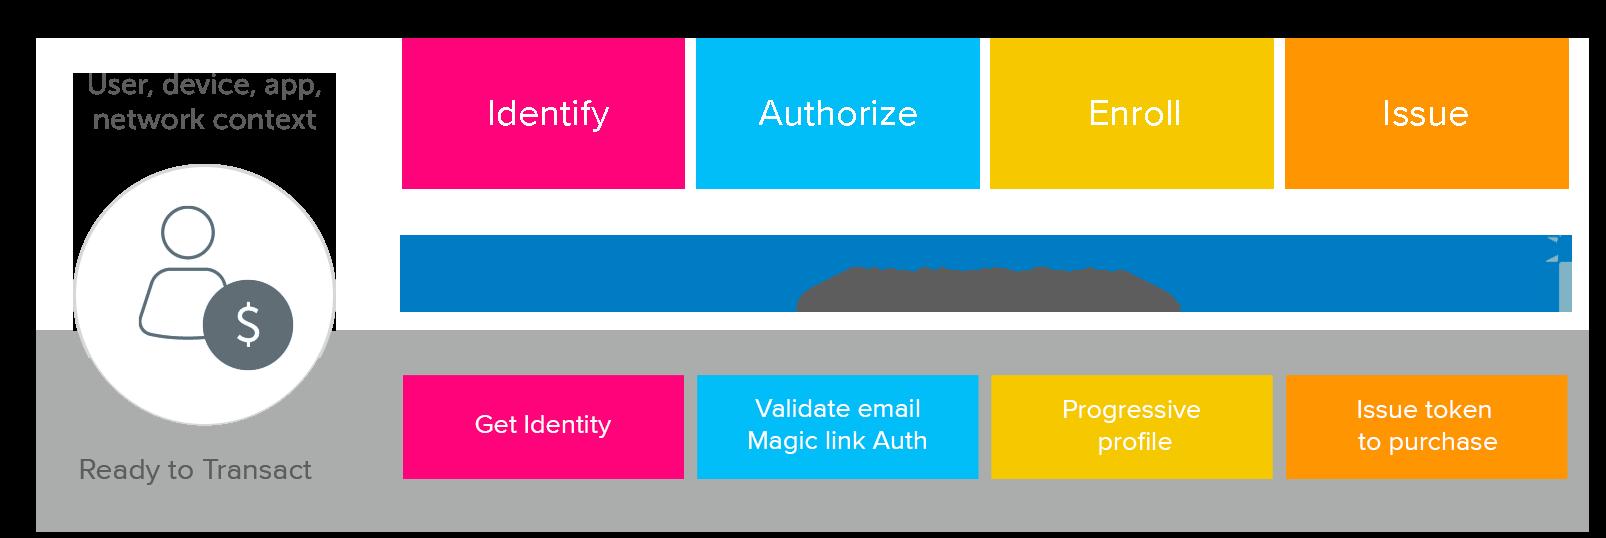 Okta Identity Engine Ready to transact New